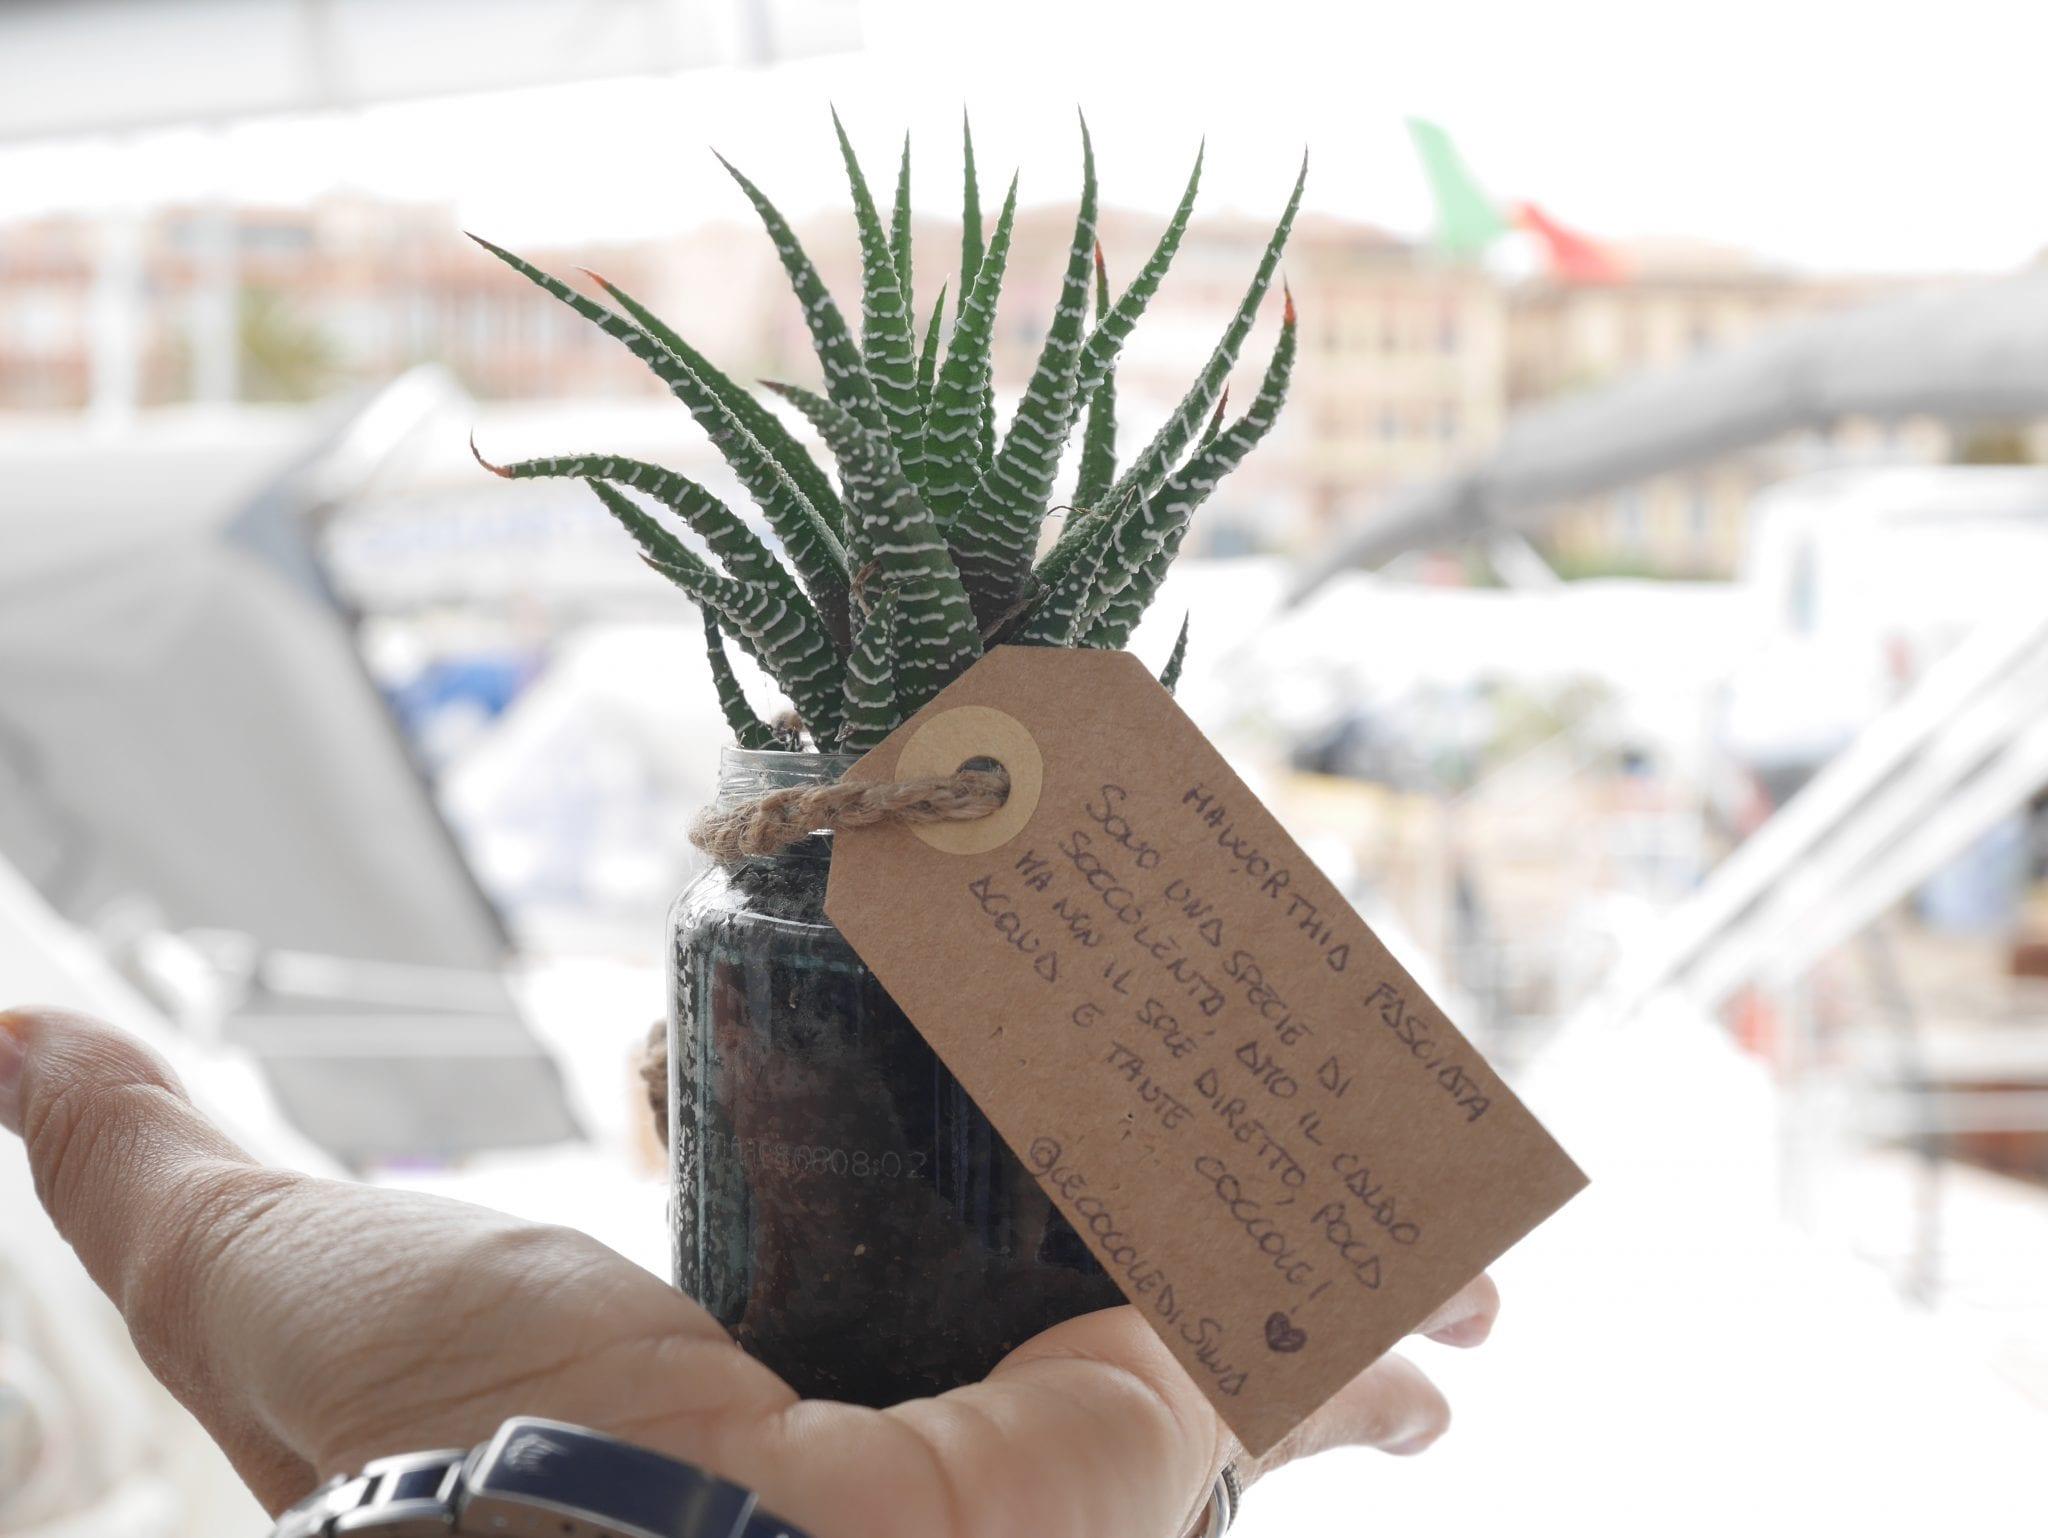 haworthia fasciata Plant swap on board - Le Plume